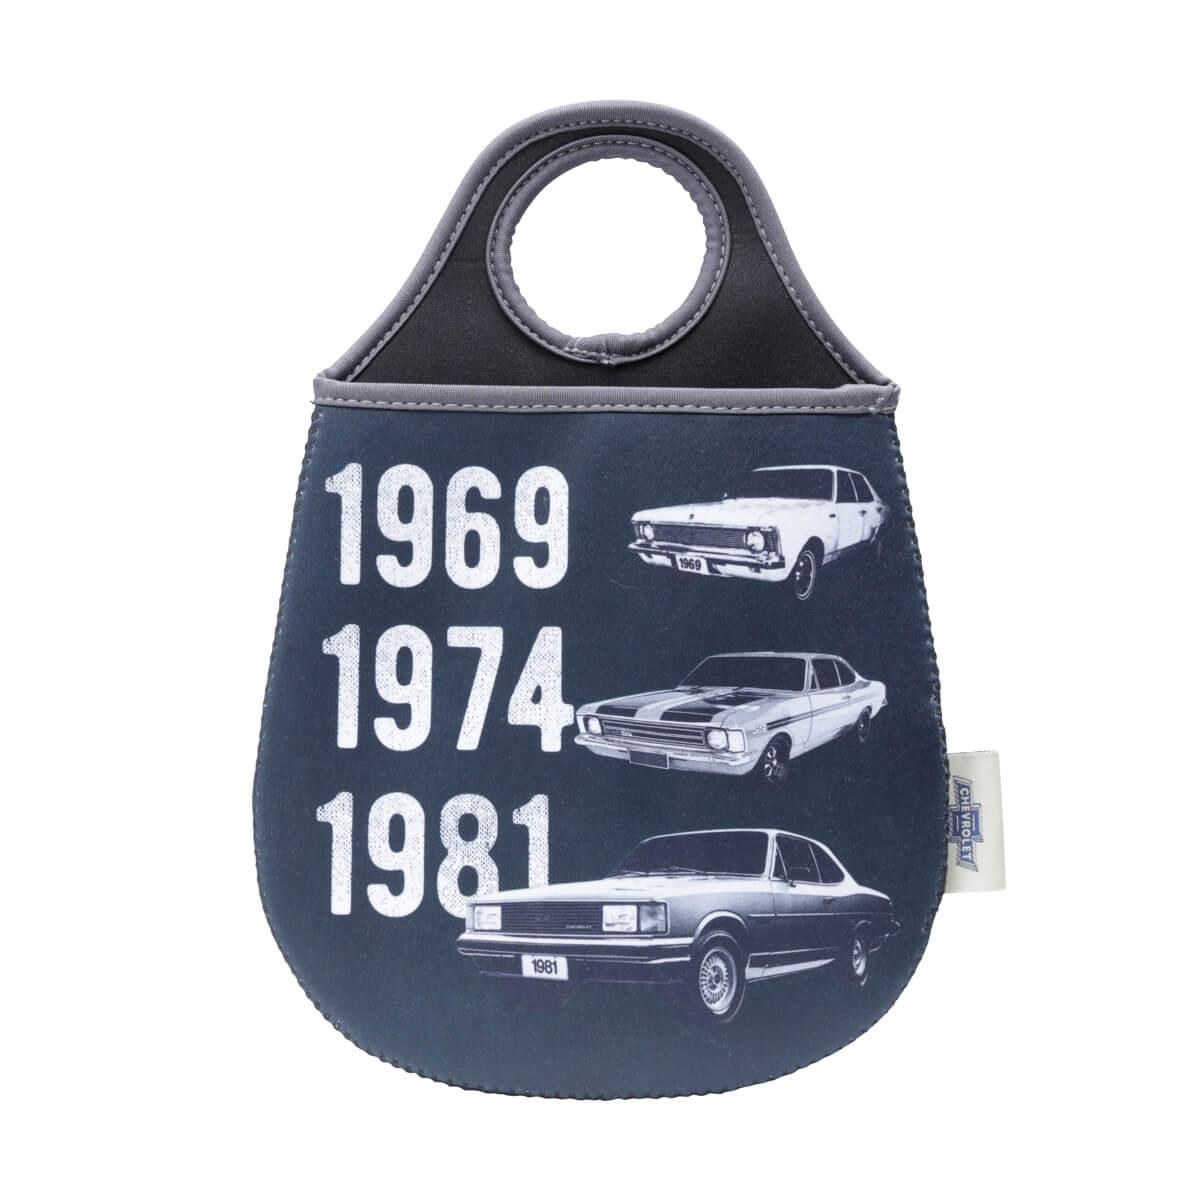 Lixeira de Carro Neoprene Chevrolet - Opala Evolution - Preto